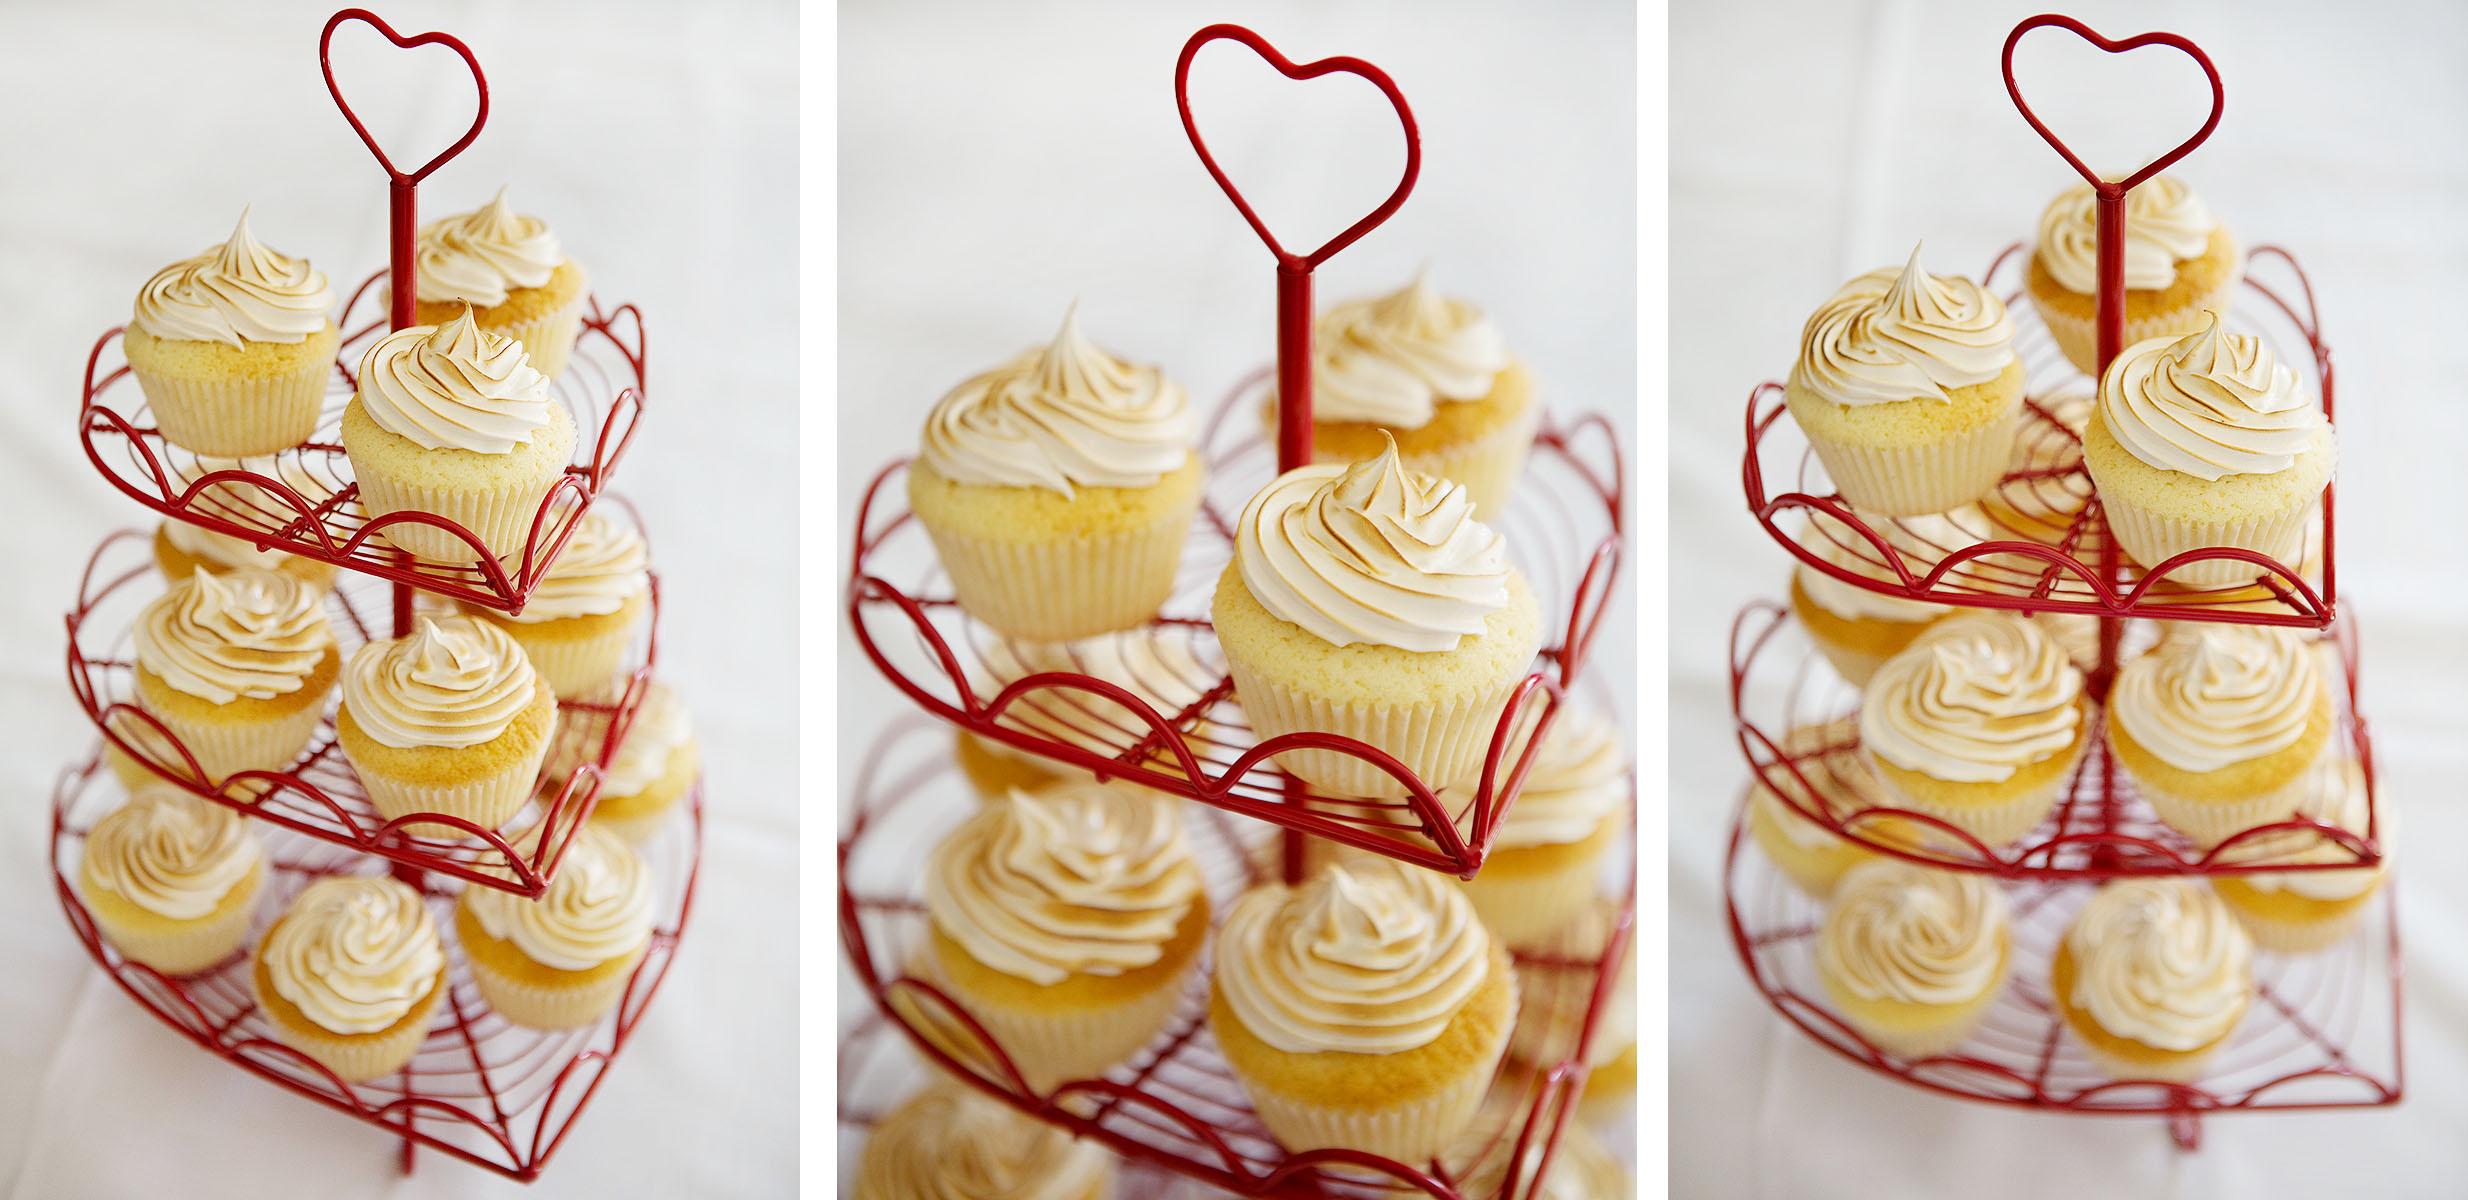 Lemon meringue hidden centre cupcakes...yum!